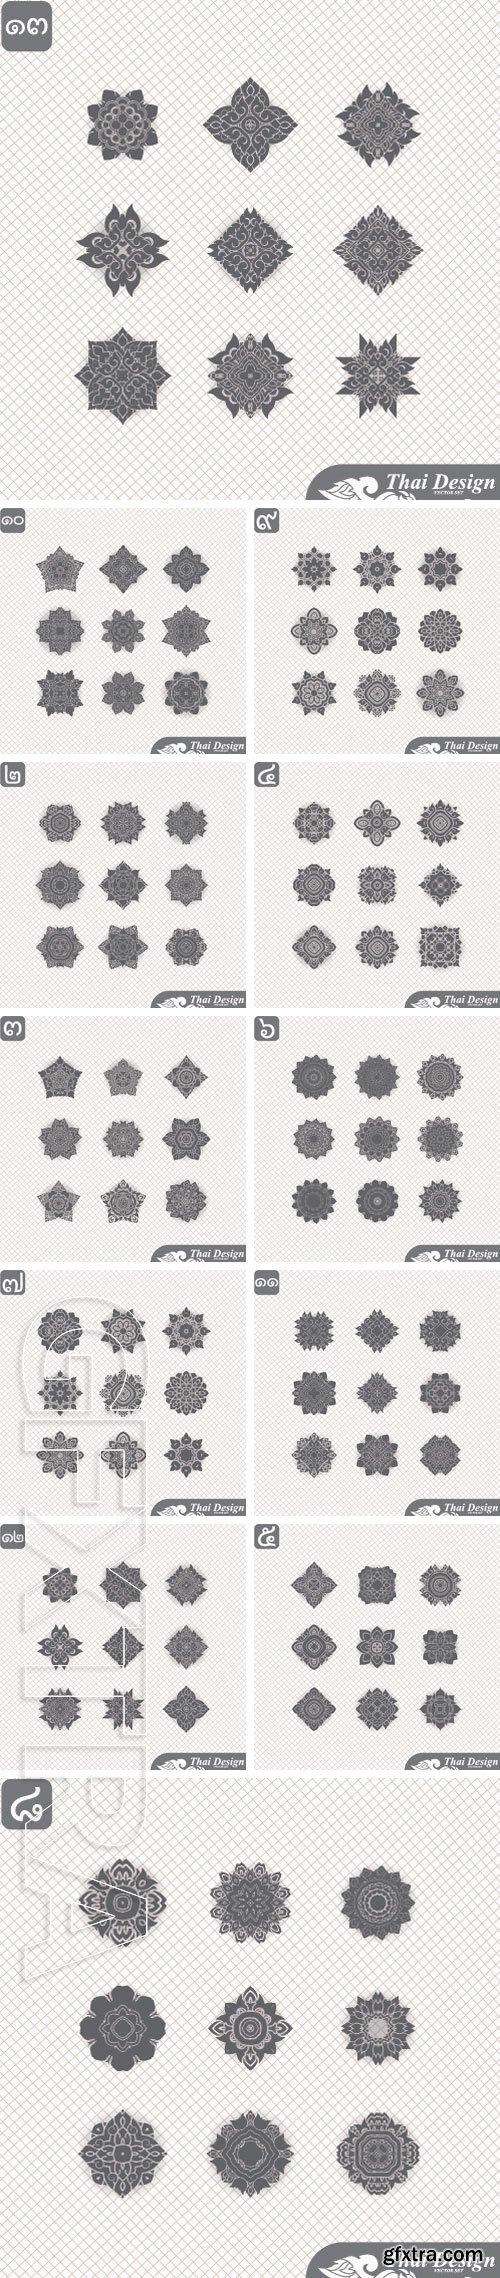 Stock Vectors - Set of Line thai art design